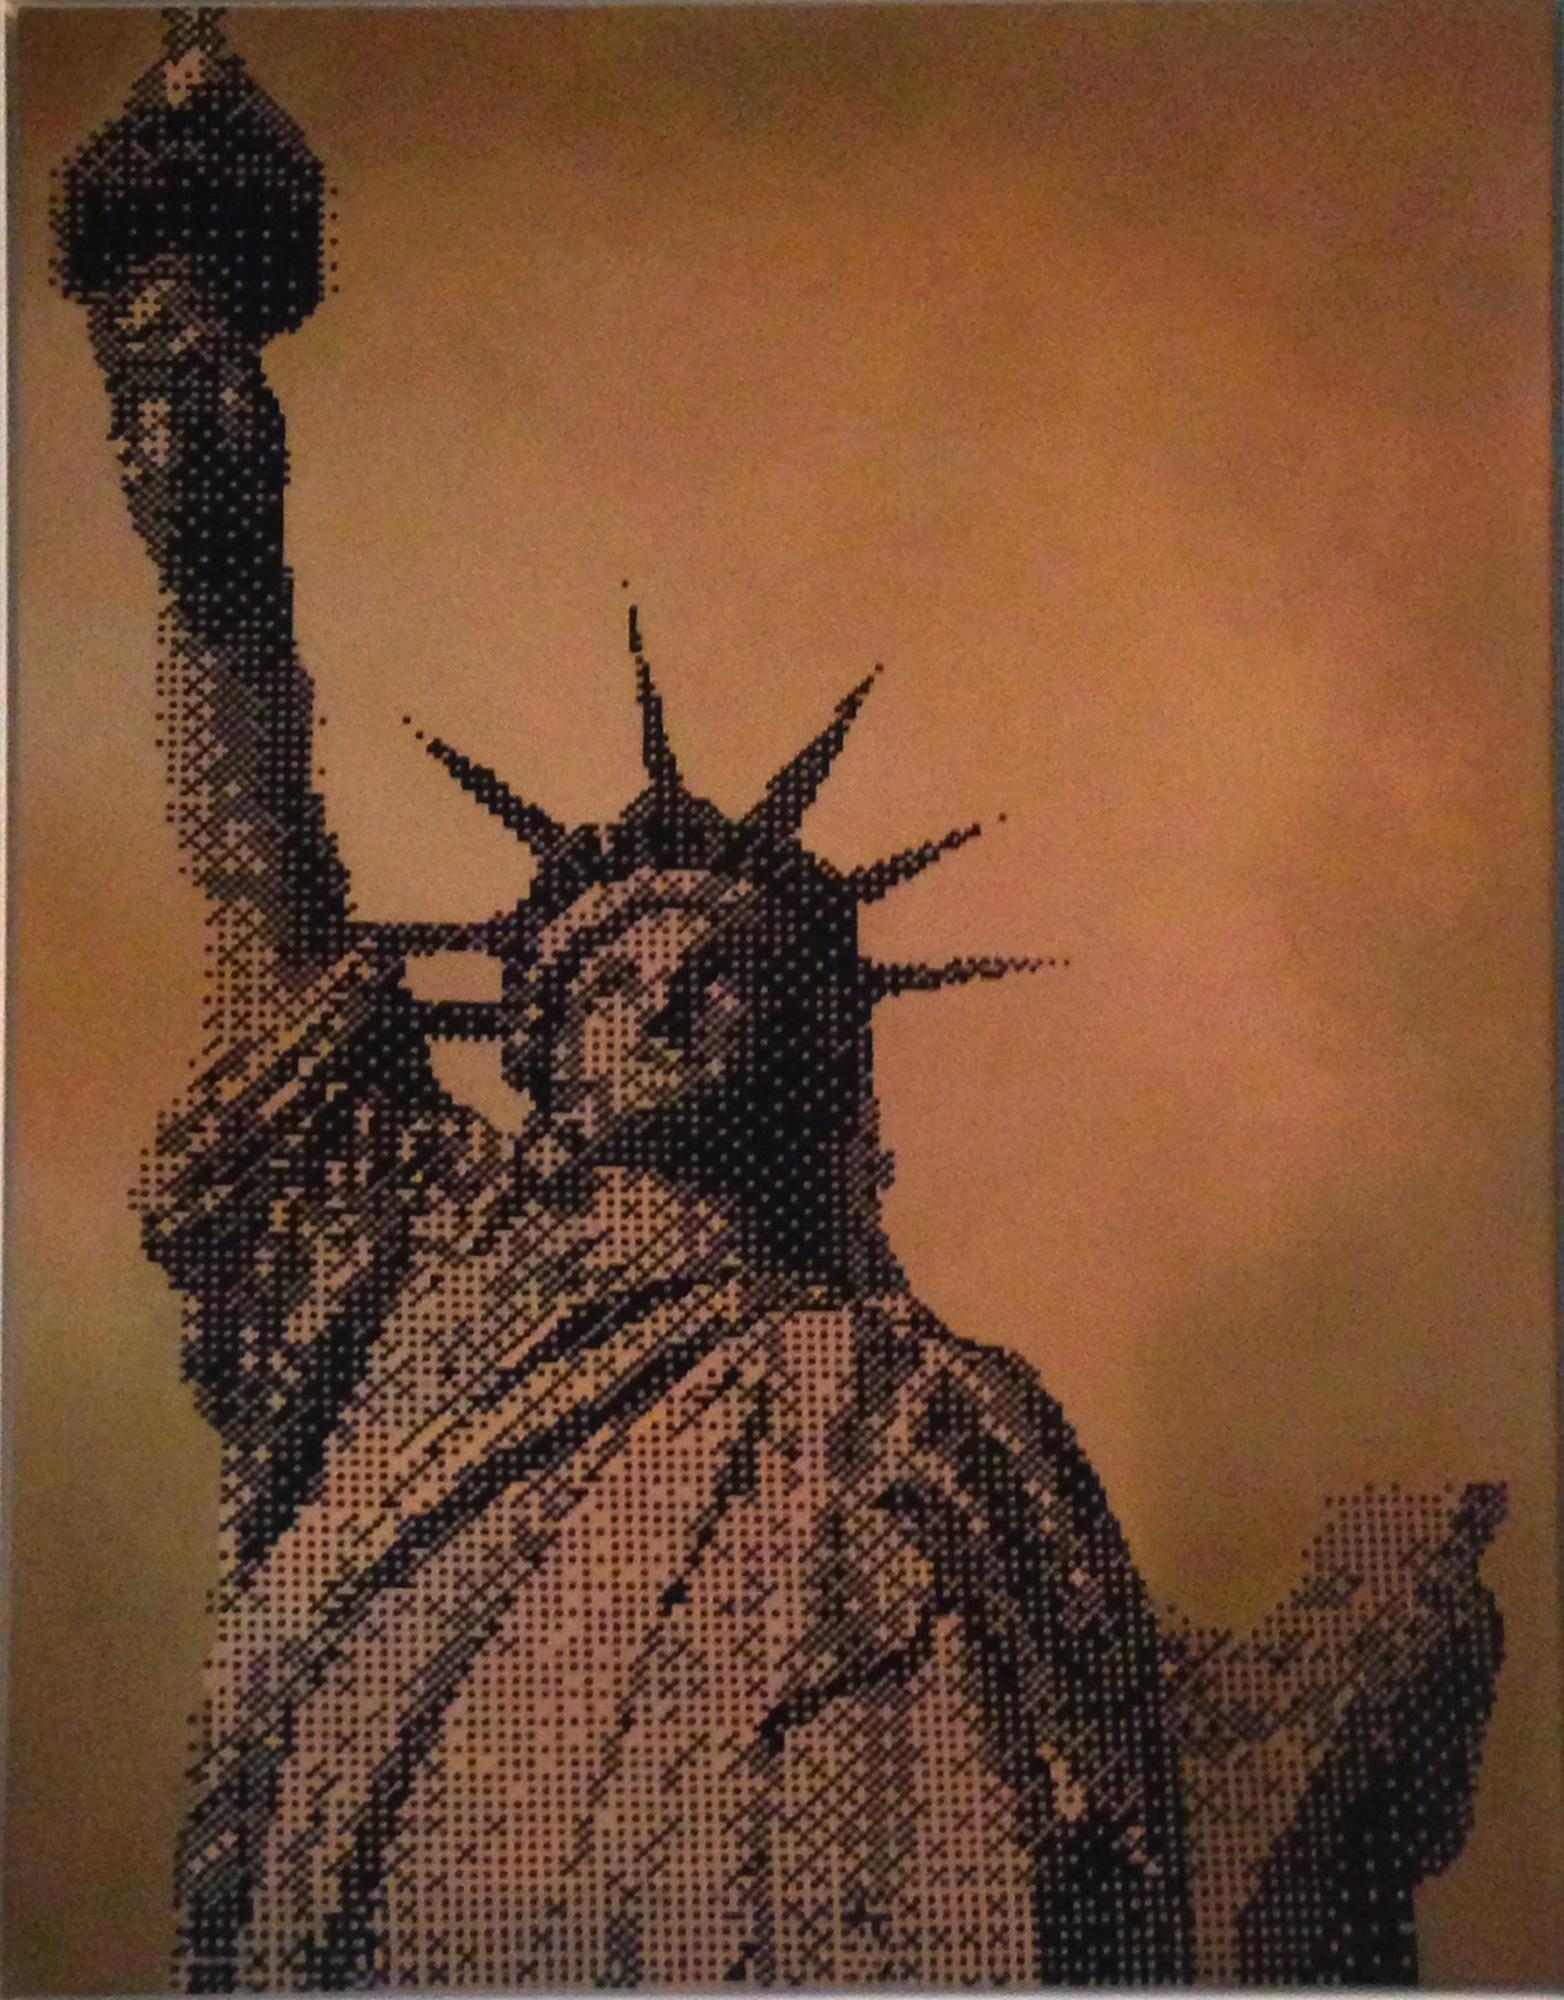 Untitled (Statue of Liberty), 2013